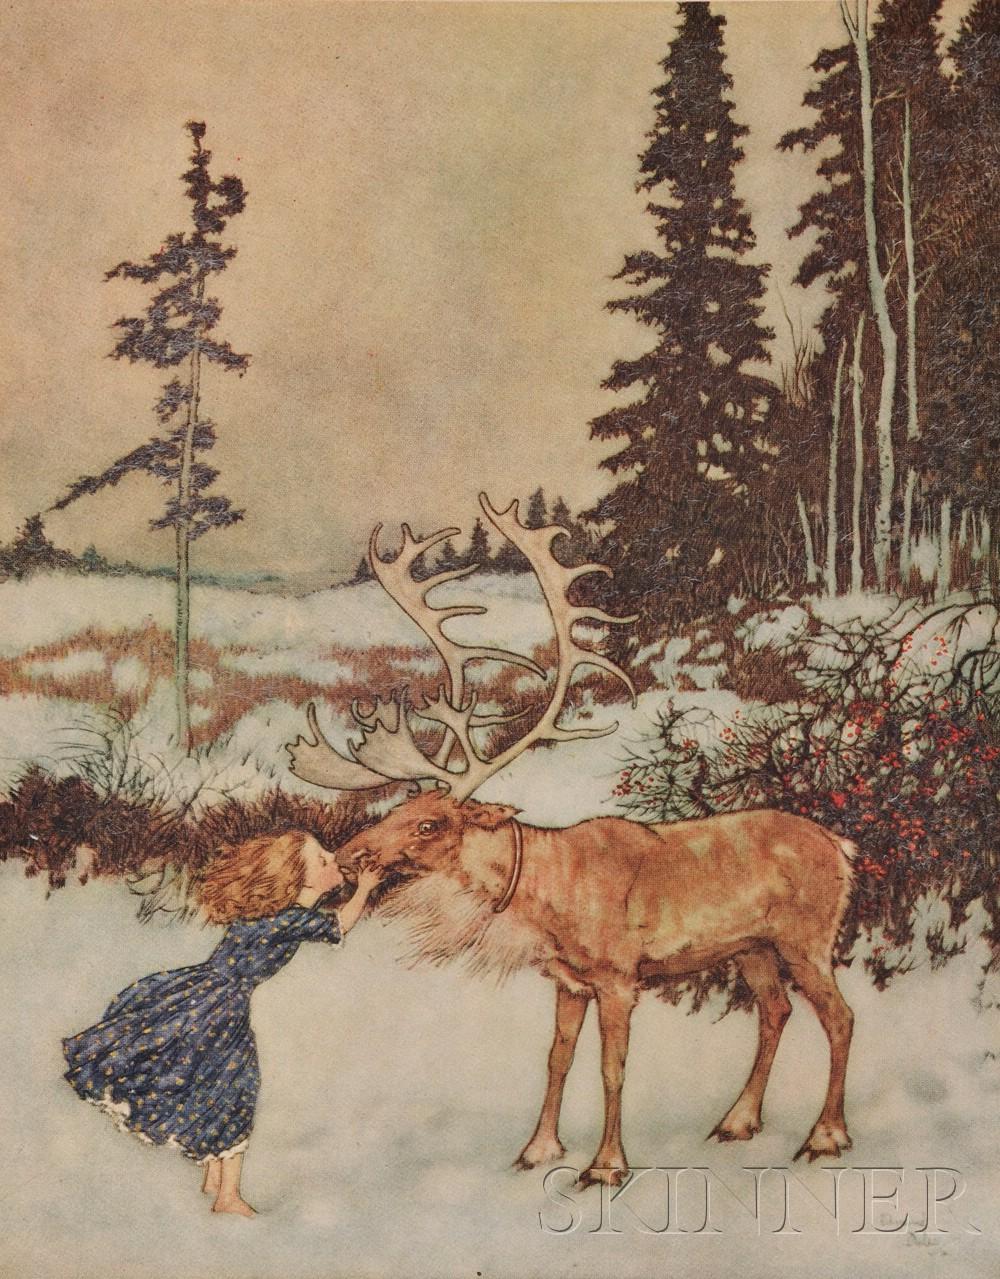 (Illustrator, 20th century), Andersen, Hans Christian (1805-1875) & Dulac, Edmund